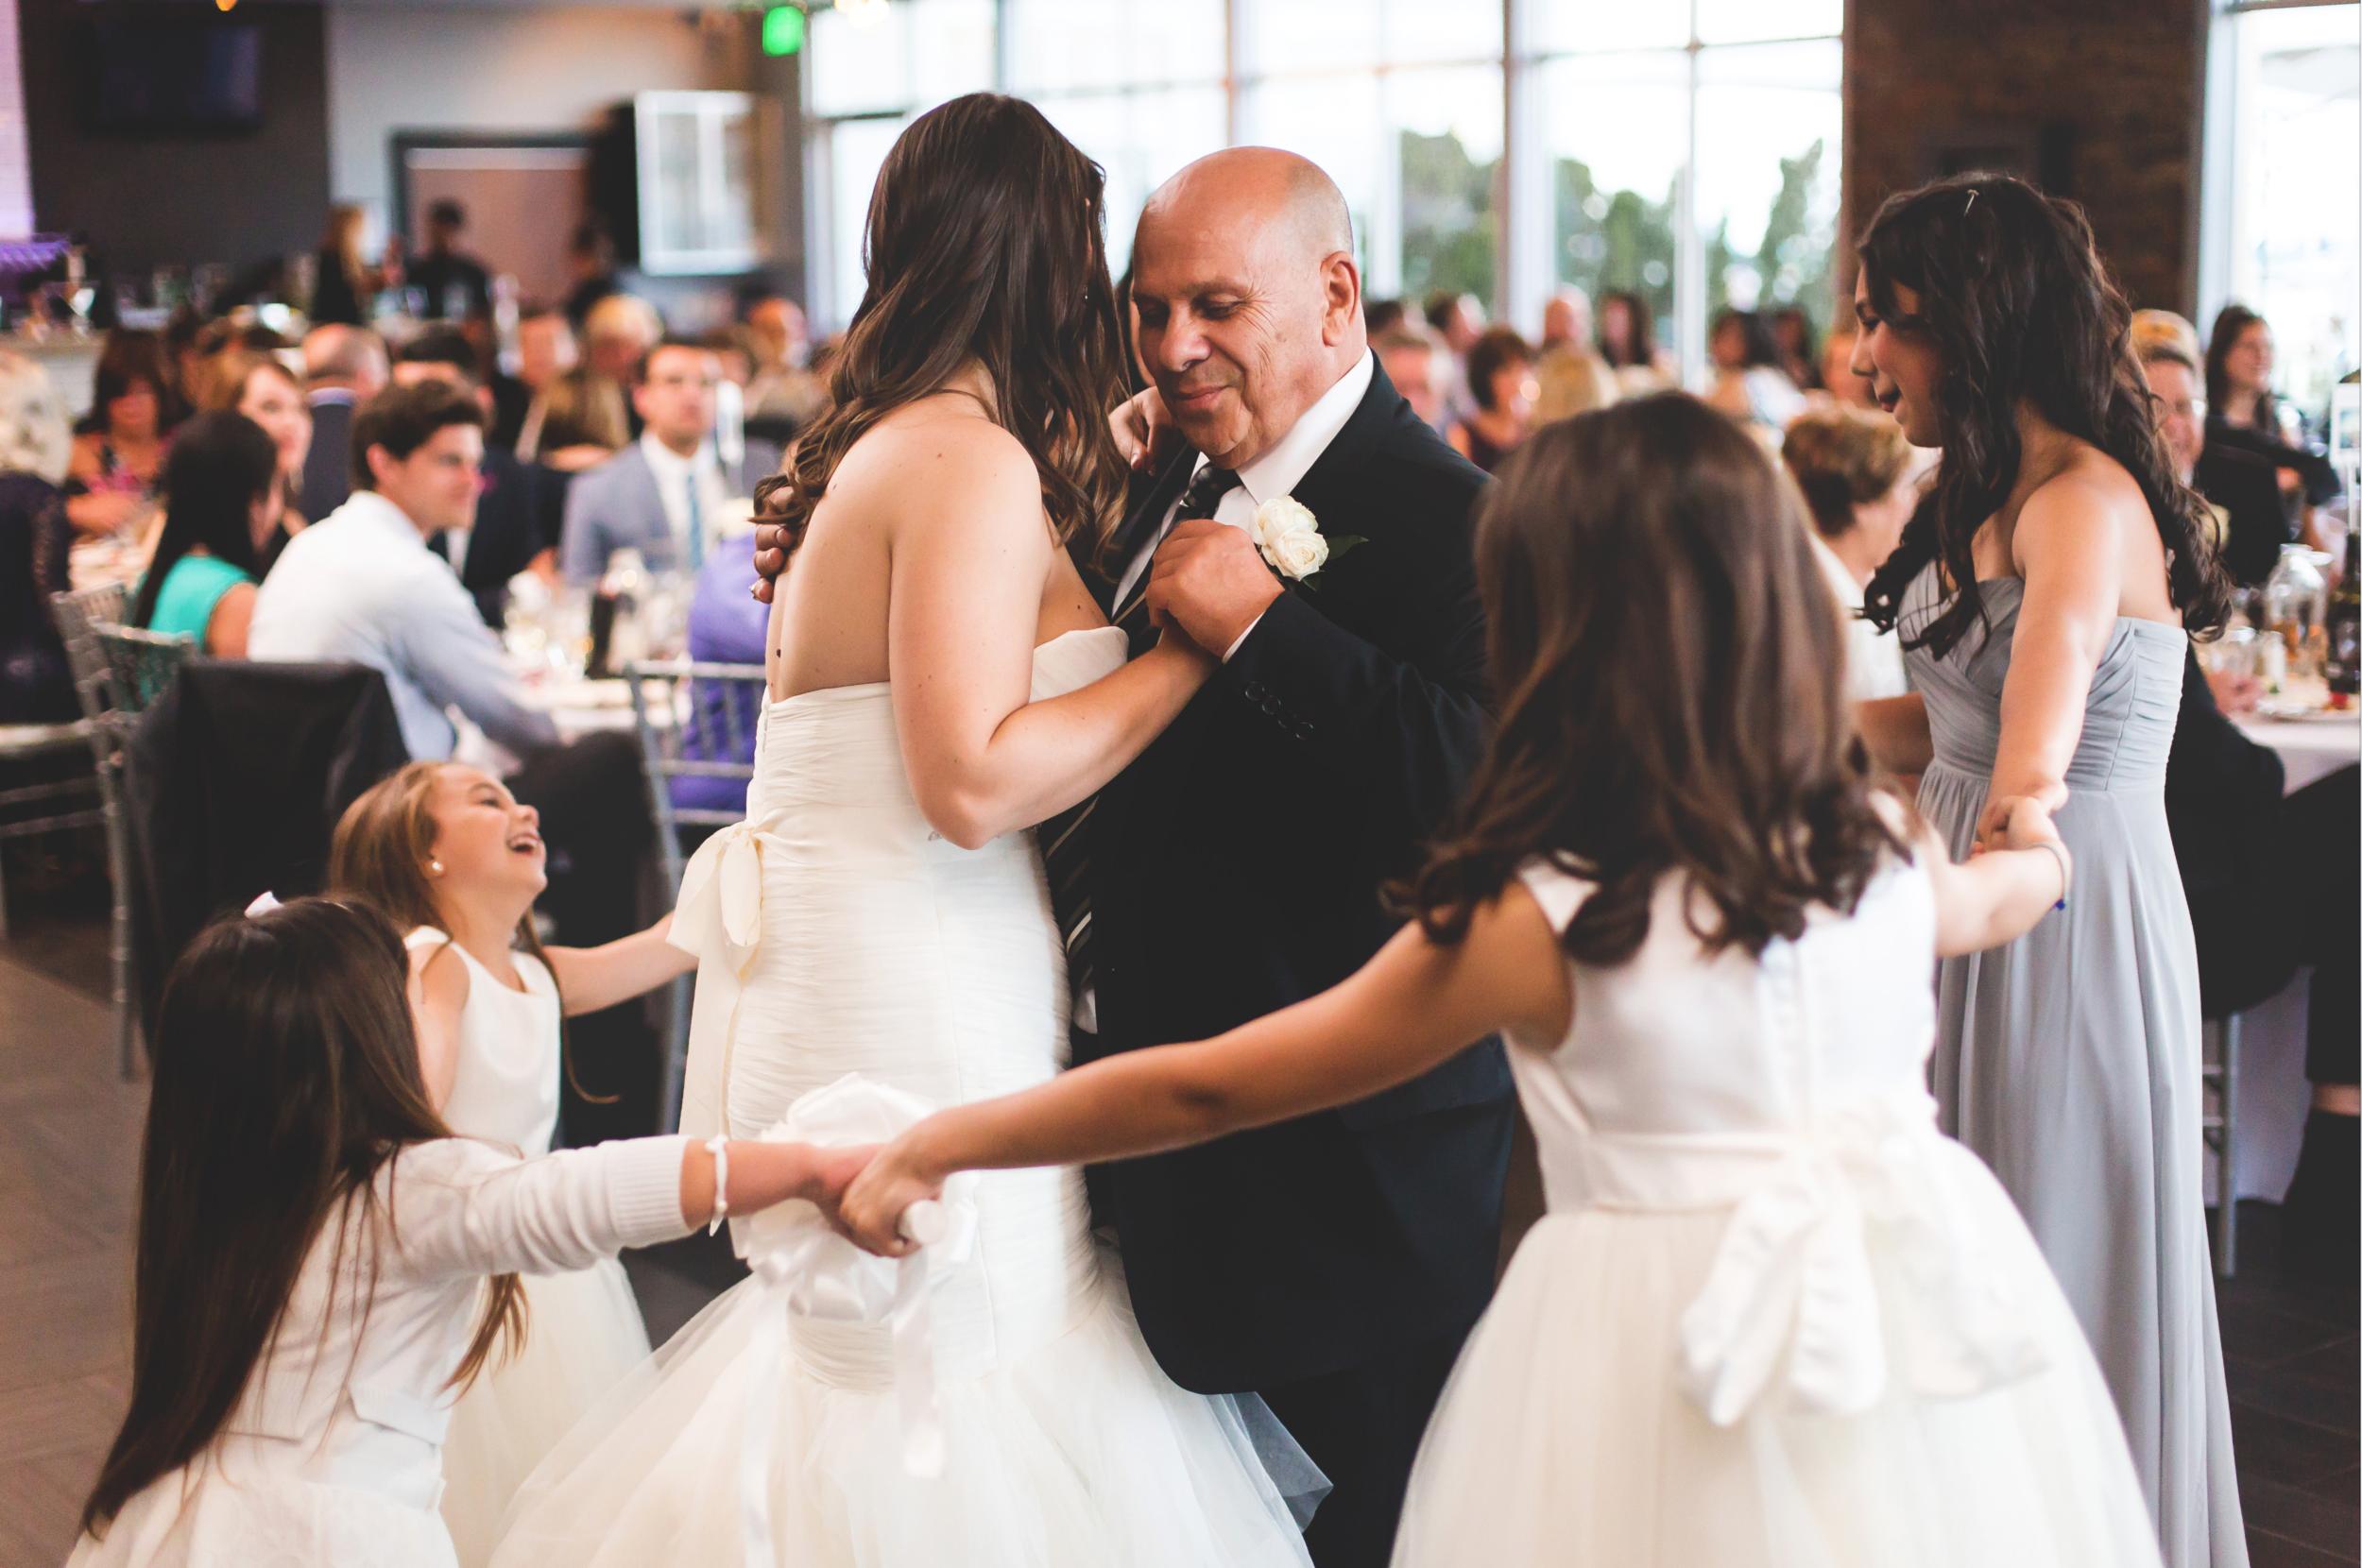 Wedding-Harbour-Banquet-Center-Oakville-Photographer-Wedding-Hamilton-Saint-James-Espresso-Downtown-HamOnt-GTA-Niagara-Toronto-Moments-by-Lauren-Photography-Photo-Image-66.png